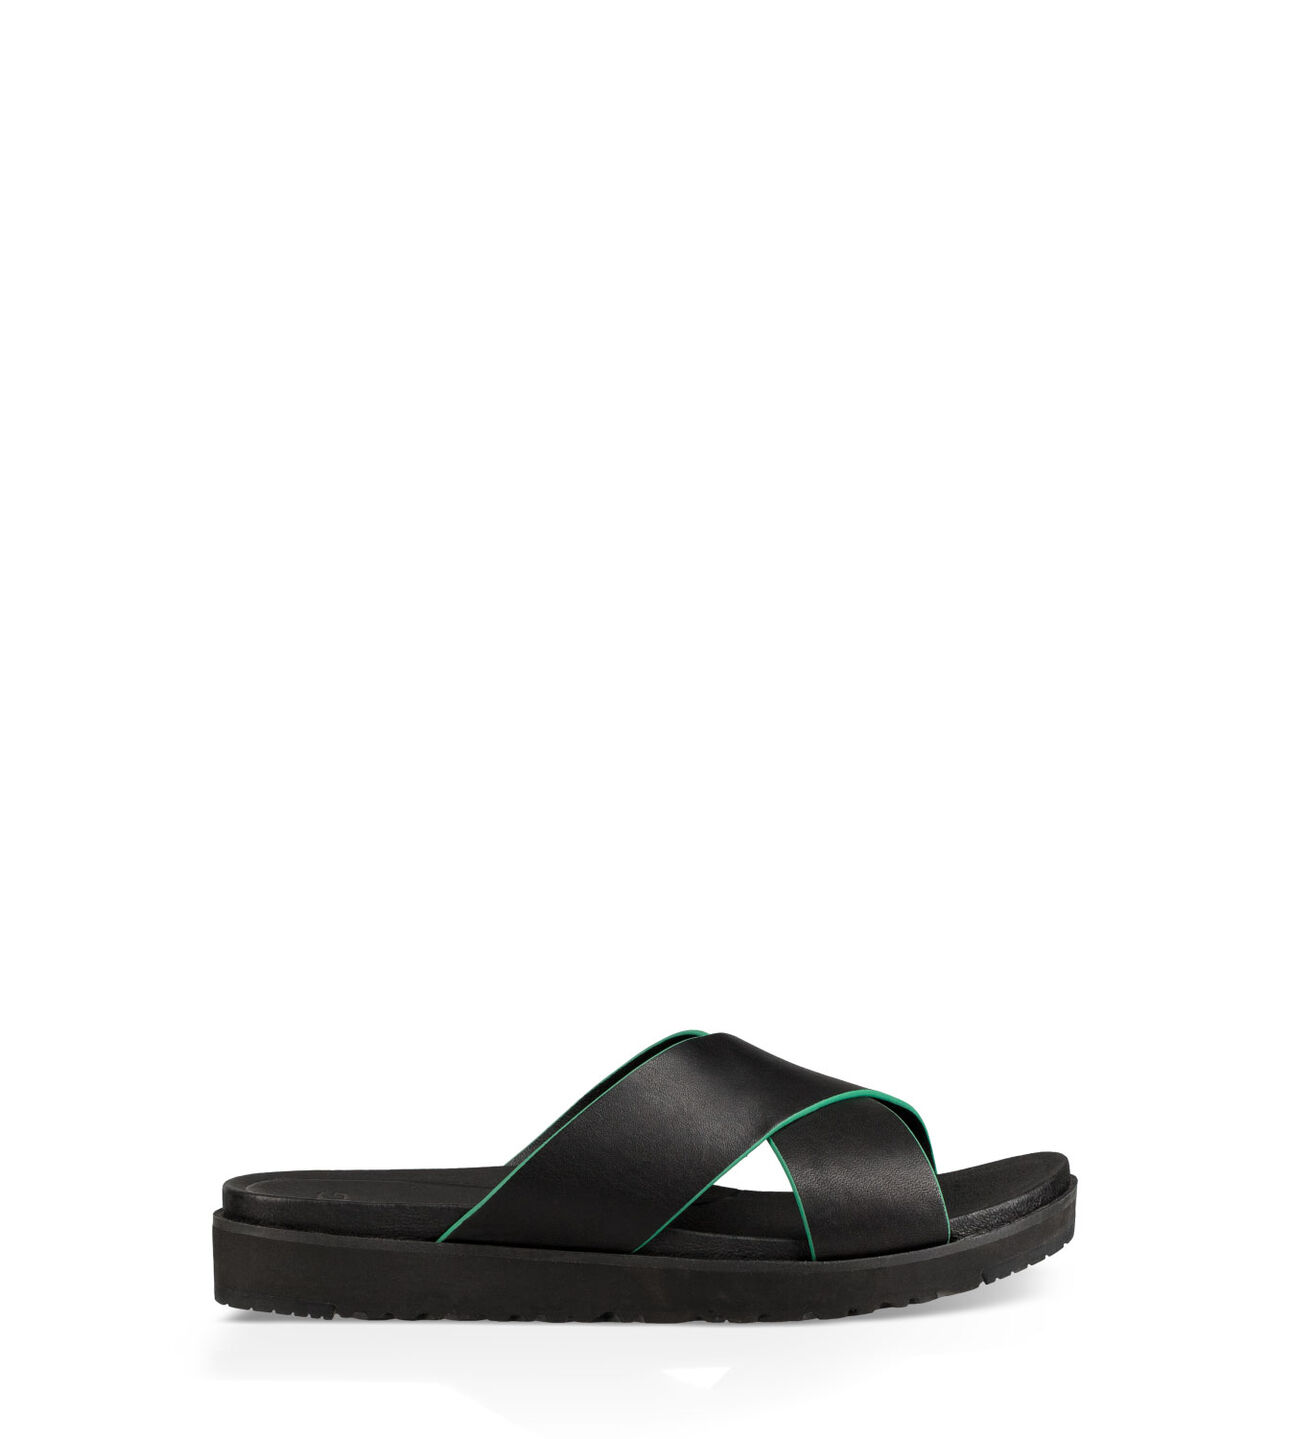 Black sandals melbourne - Kari